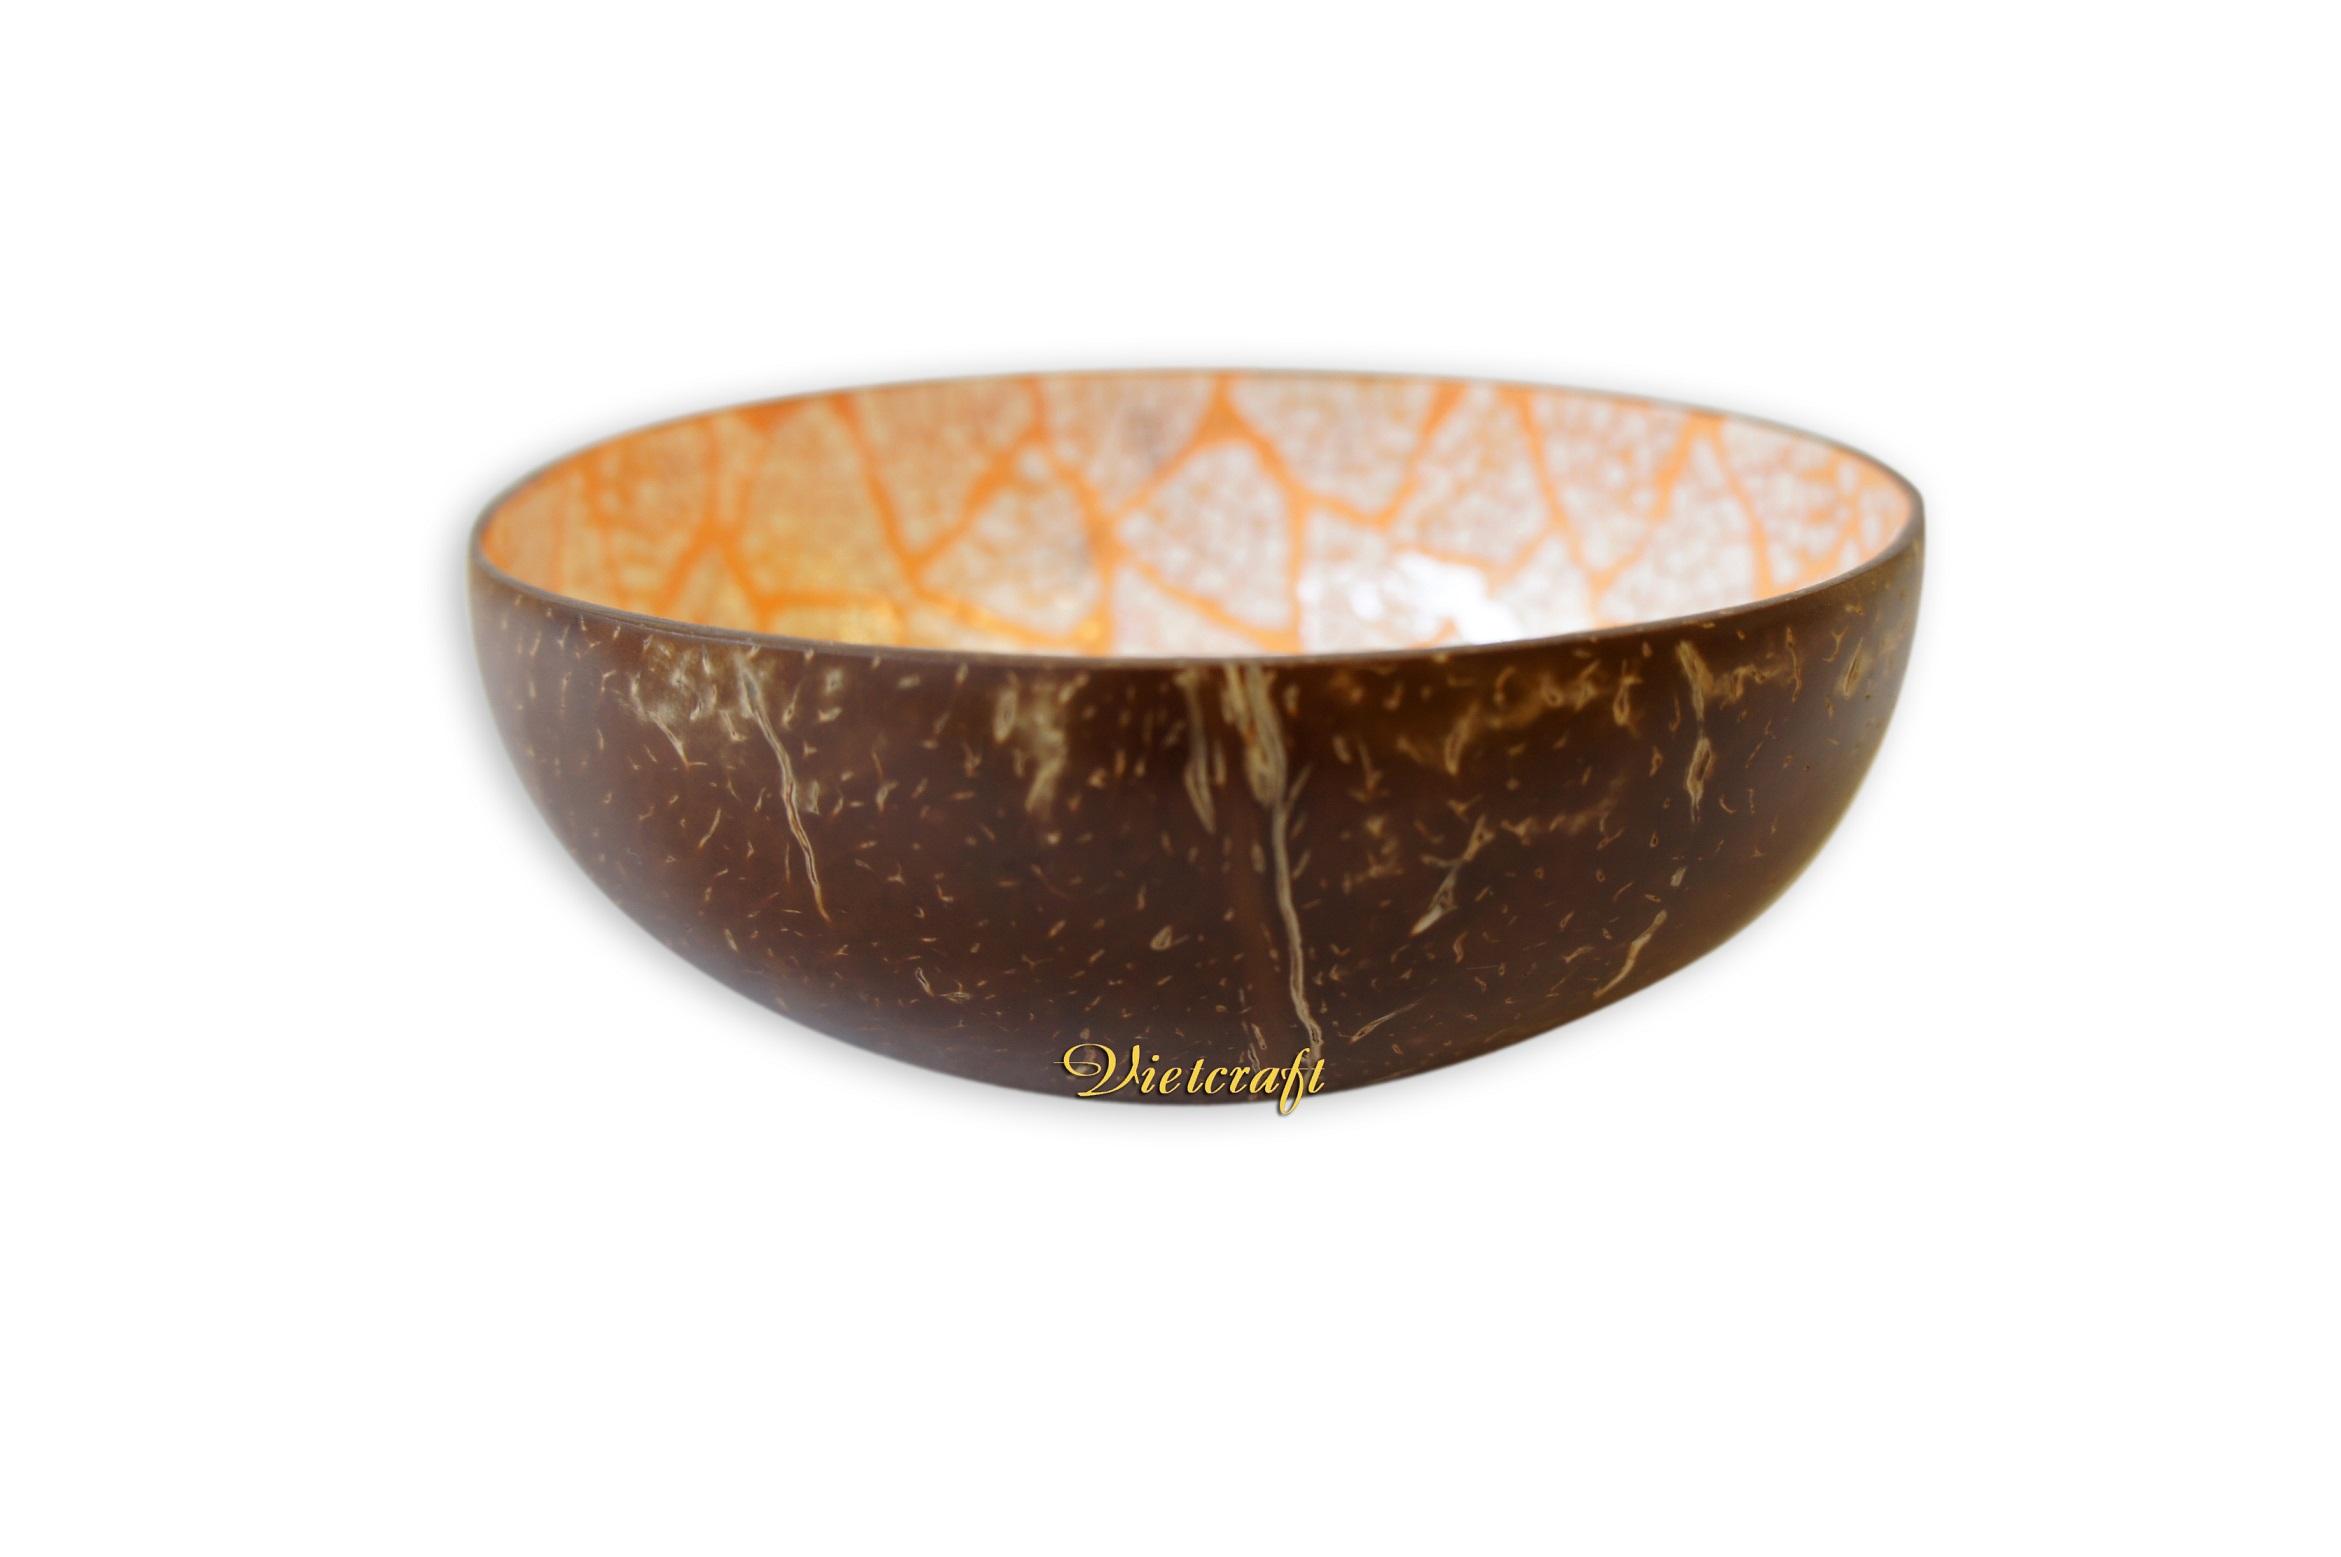 coconut bowls - photo #19